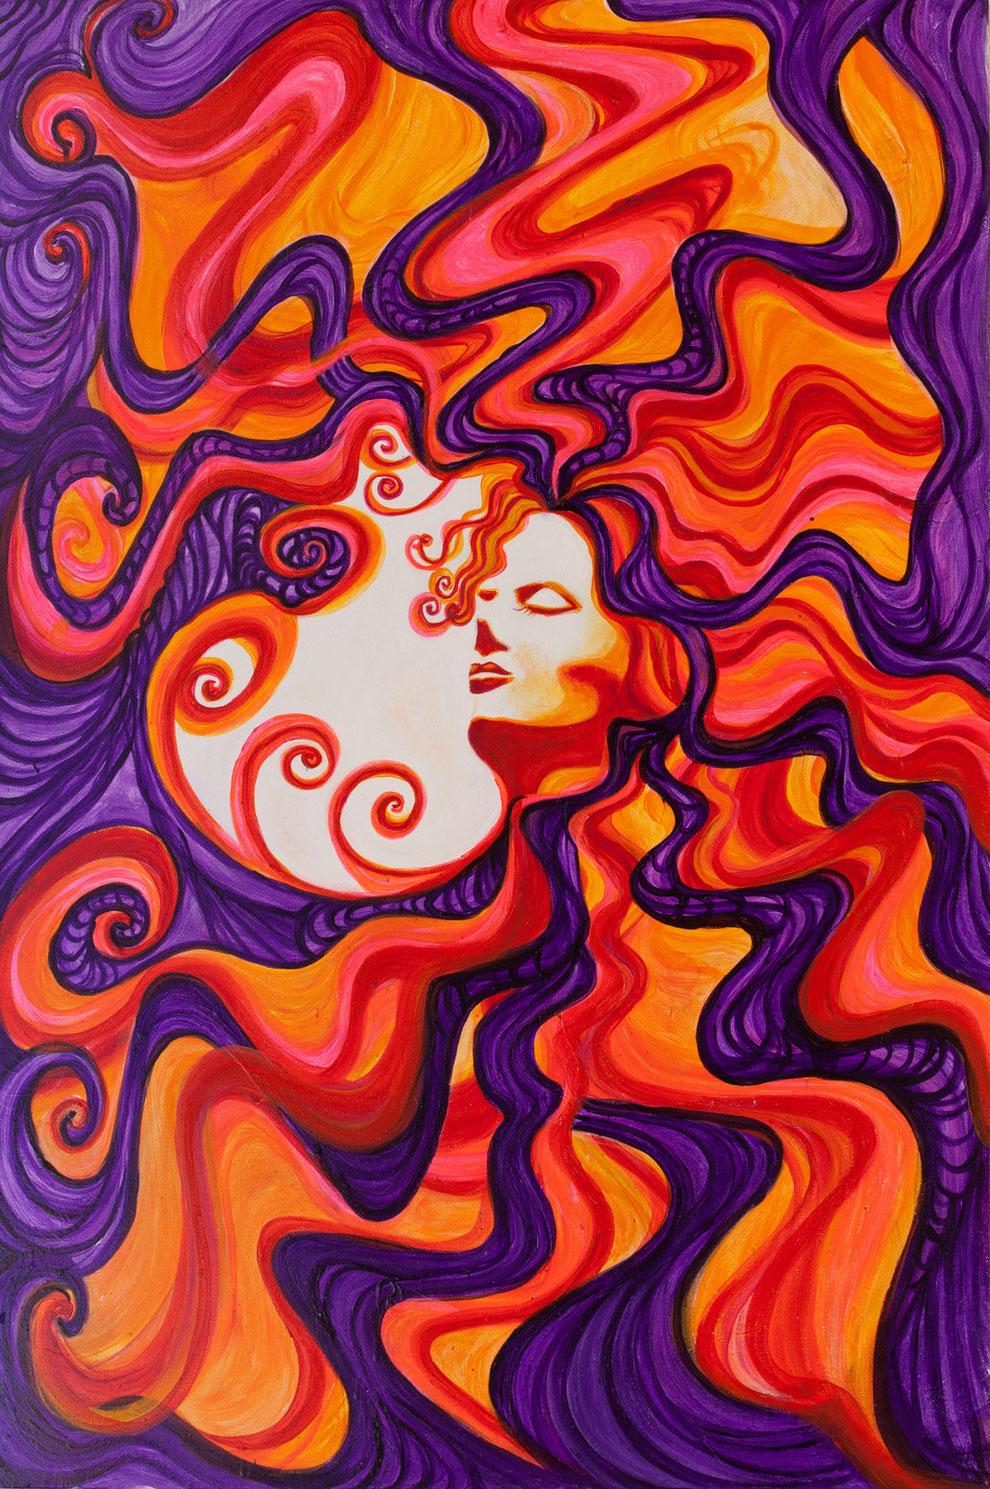 Hervorragend Psychedelic Art - Gallery - Donna McCain CQ11